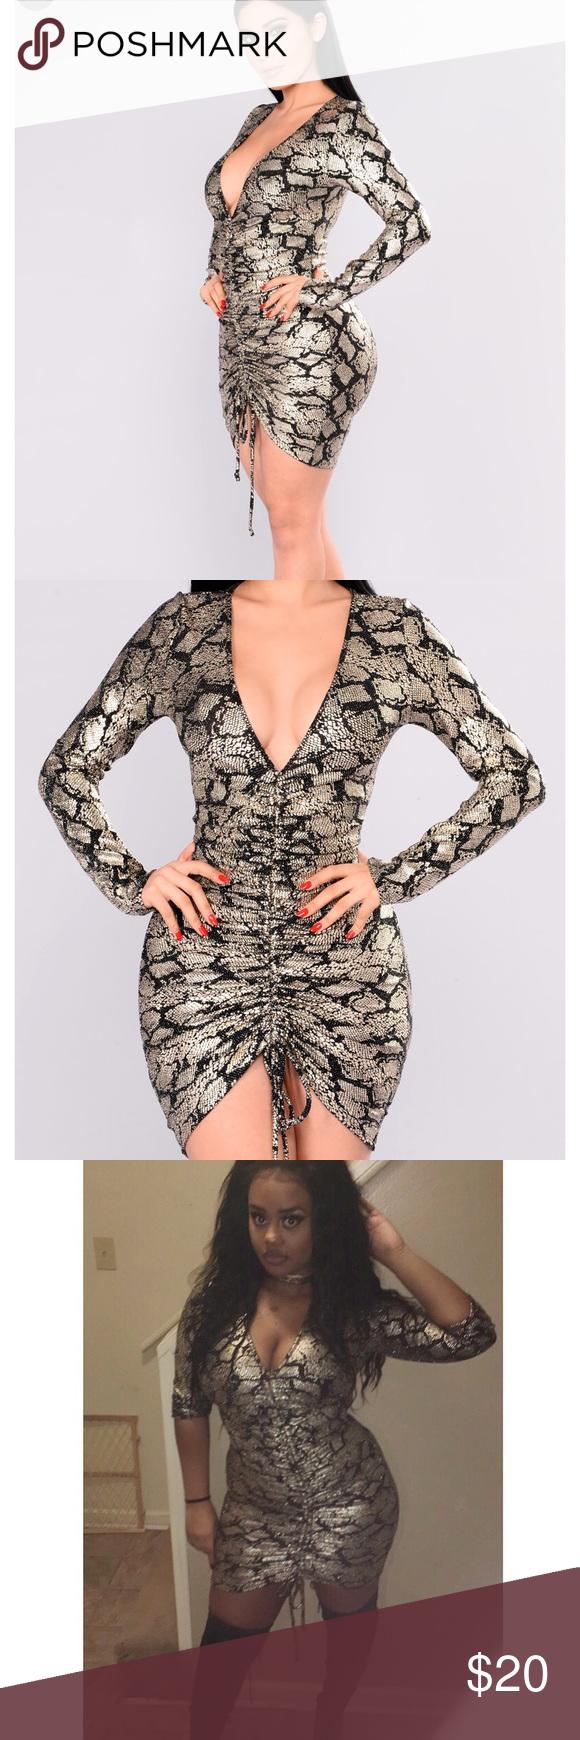 Gold Metallic Snakeskin Dress (With images) Fashion nova